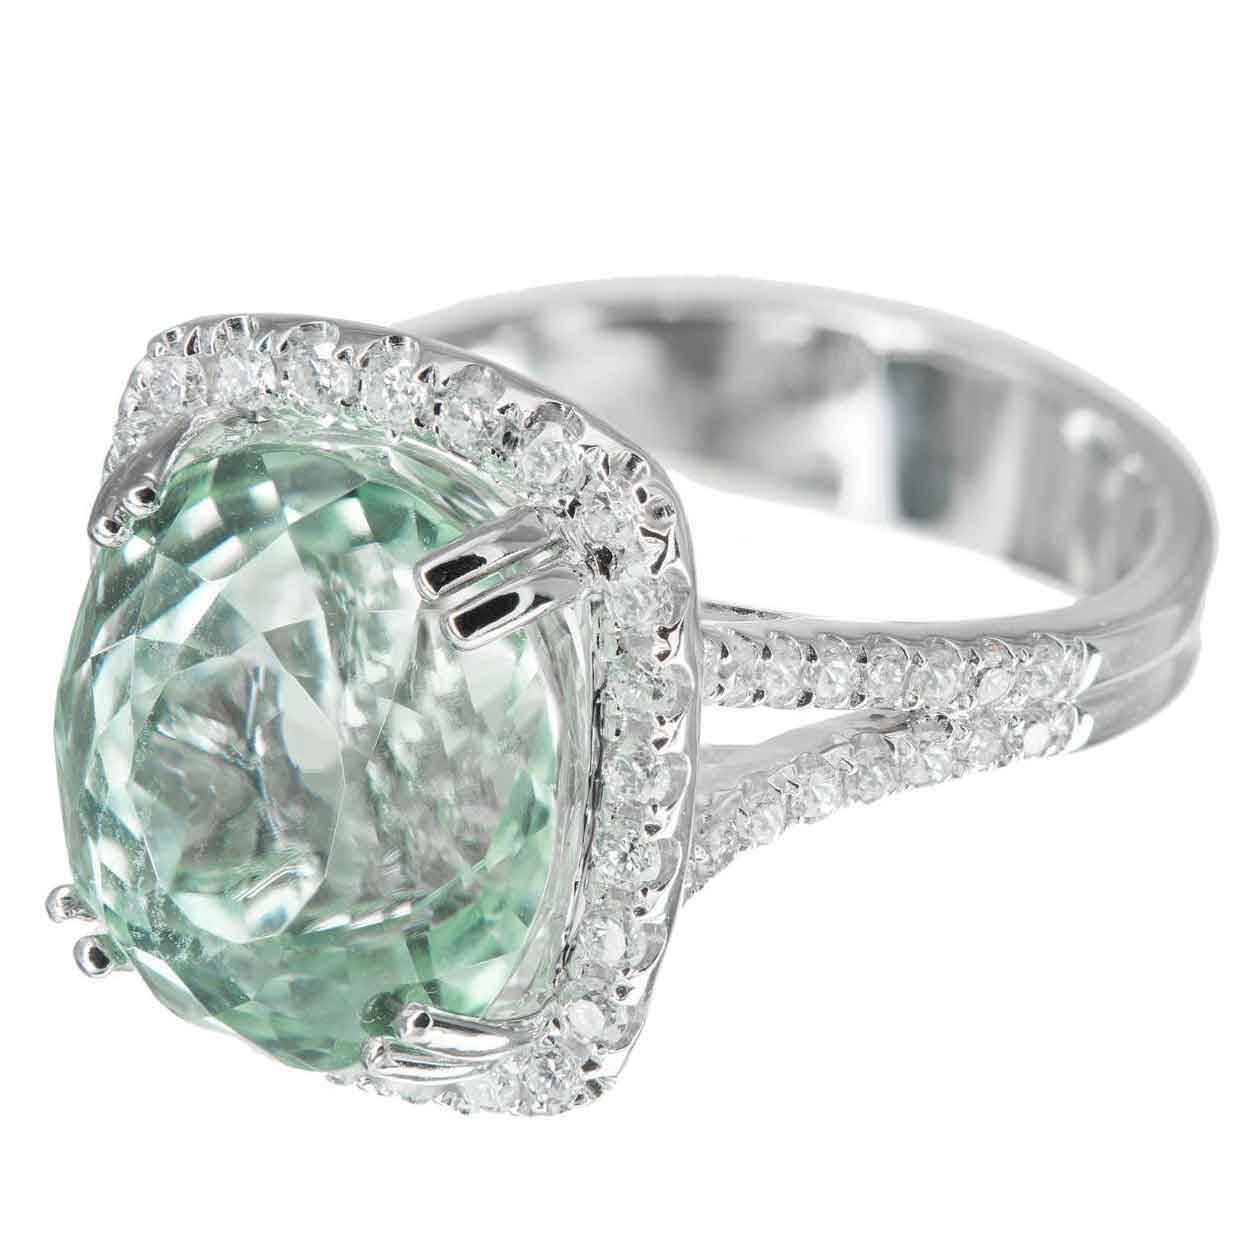 oval natural light green tourmaline diamond gold ring for. Black Bedroom Furniture Sets. Home Design Ideas